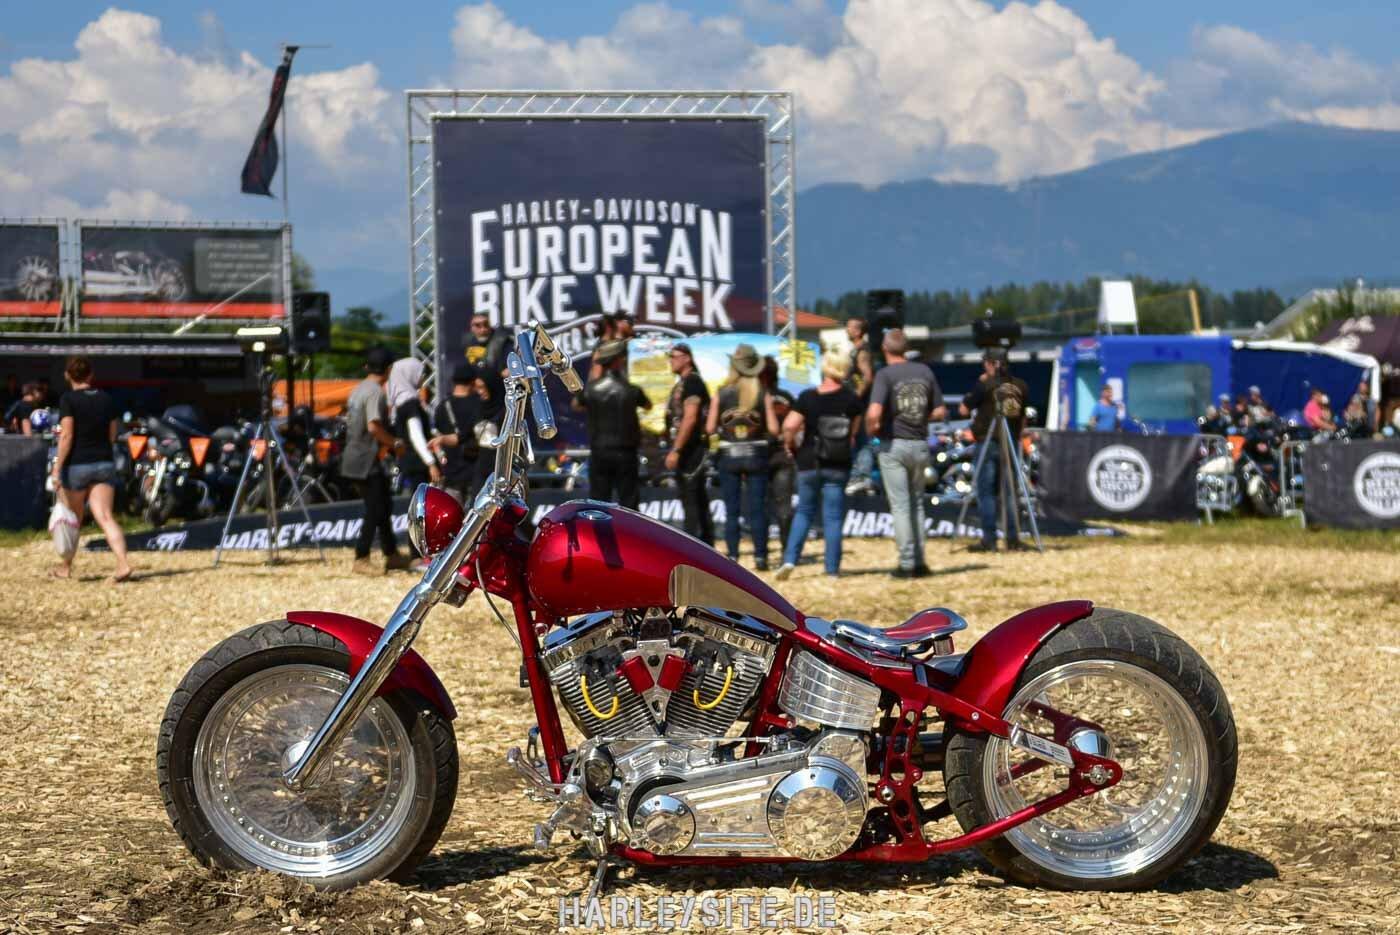 European-Bike-Week-16